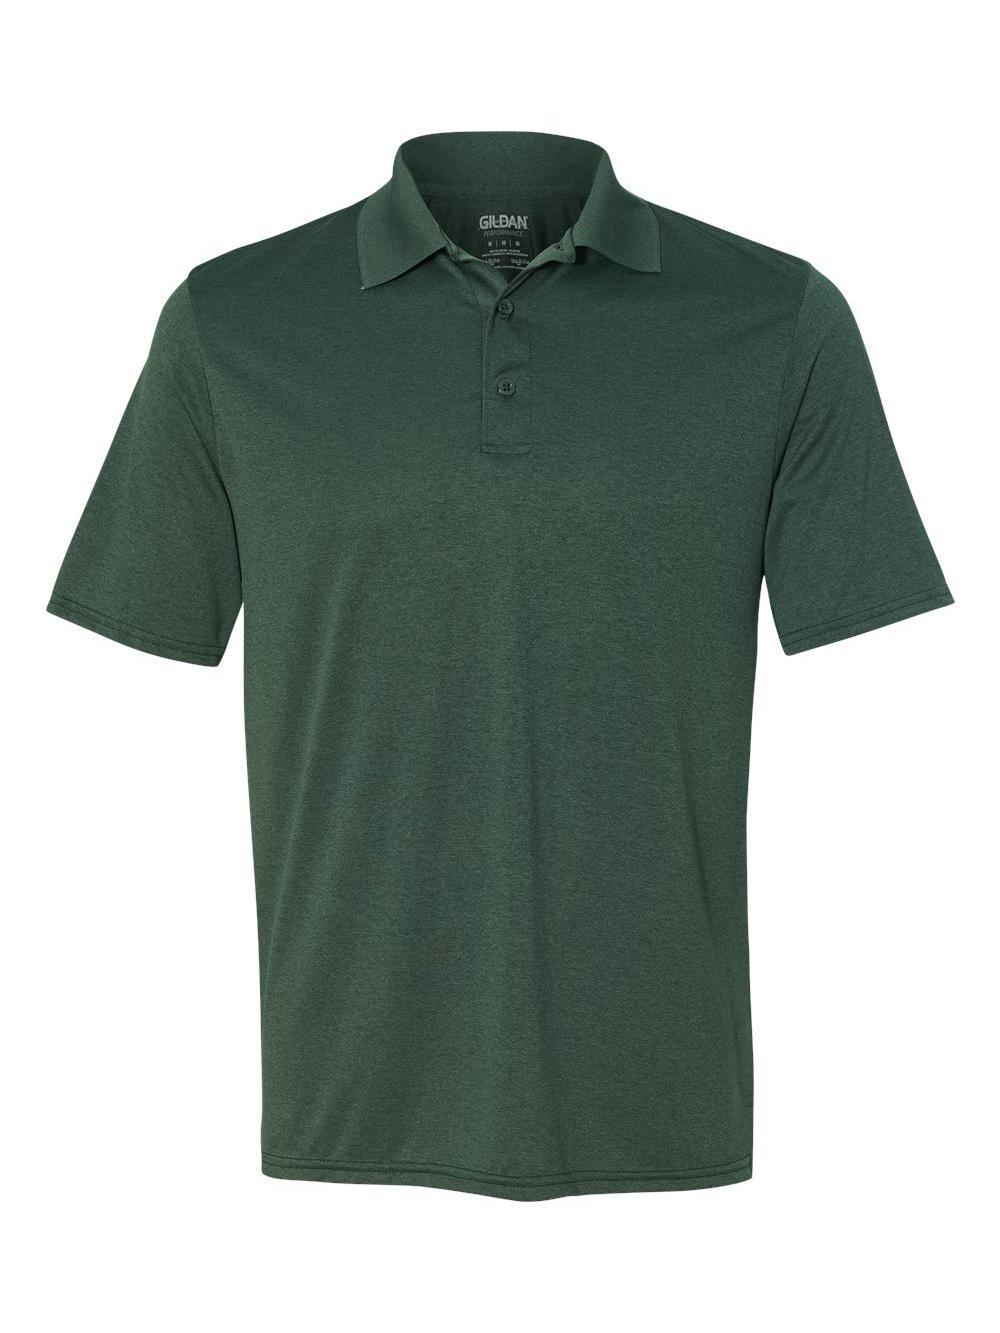 Gildan-Performance-Jersey-Sport-Shirt-44800 thumbnail 9